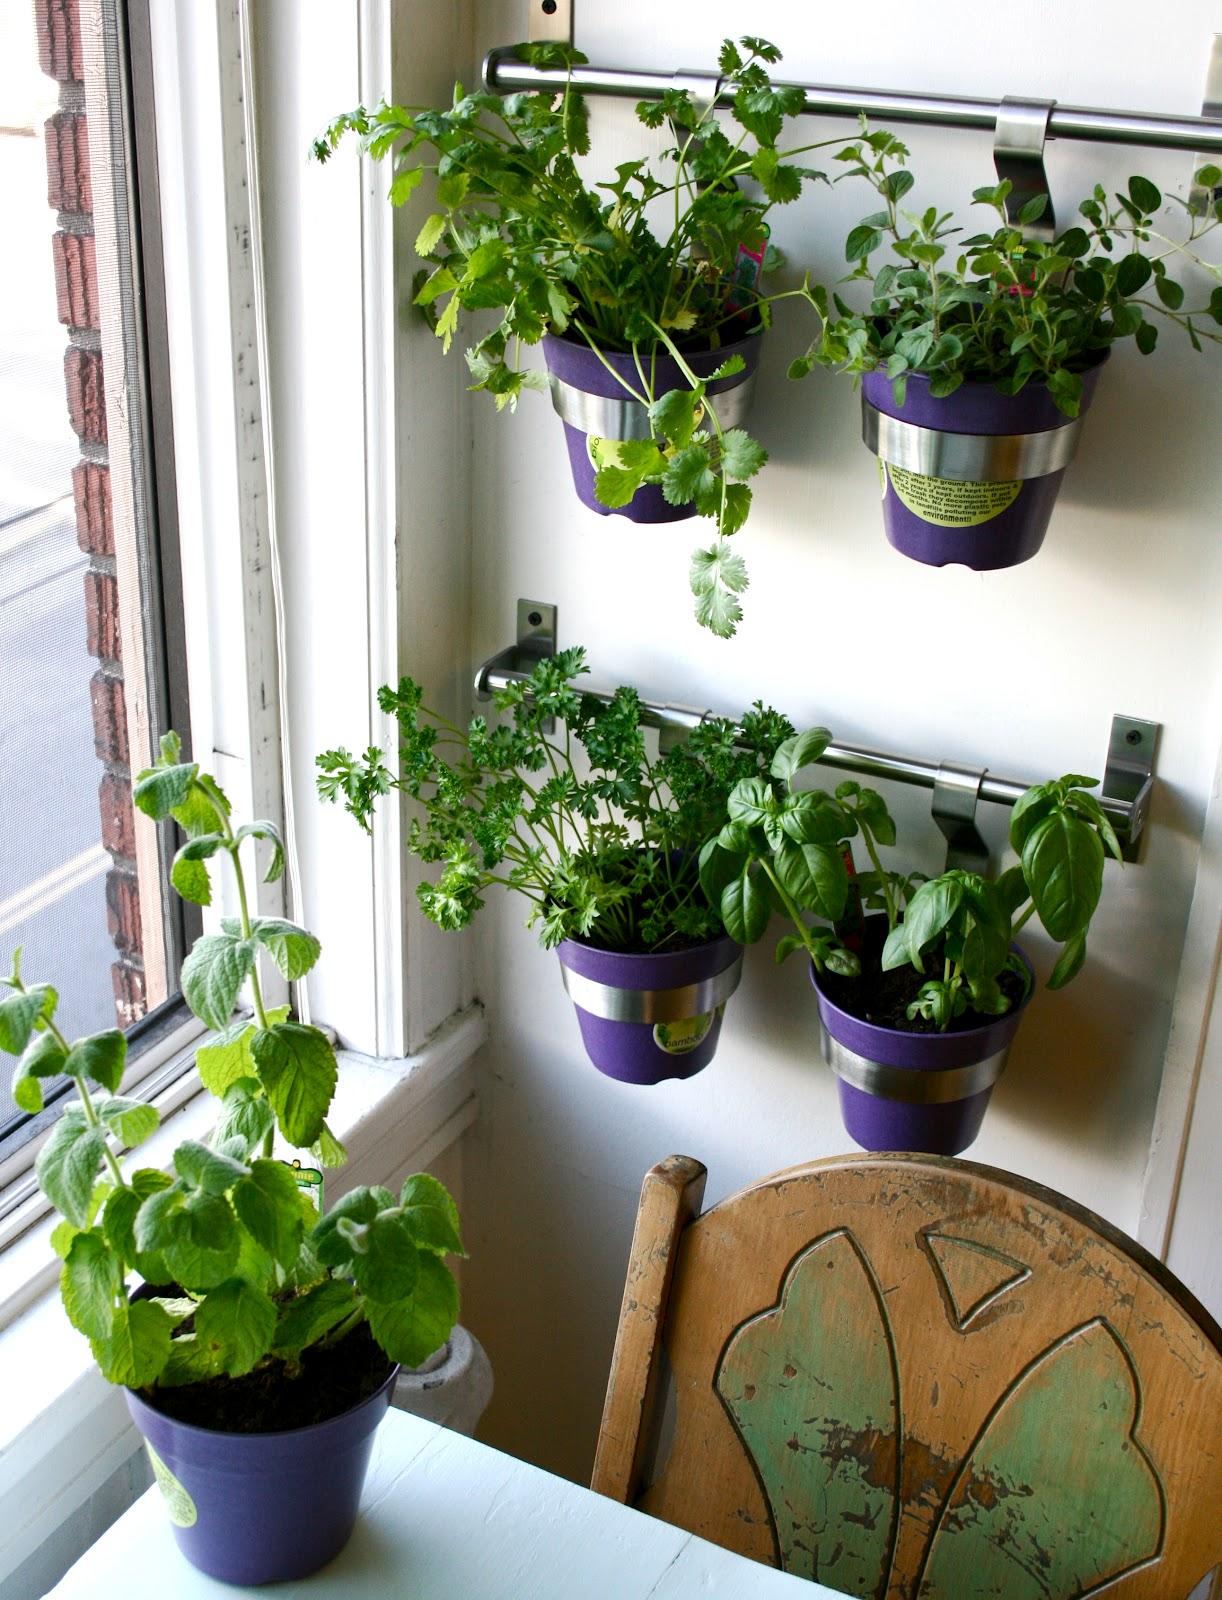 Kitchen Herbs To Grow HomesFeed